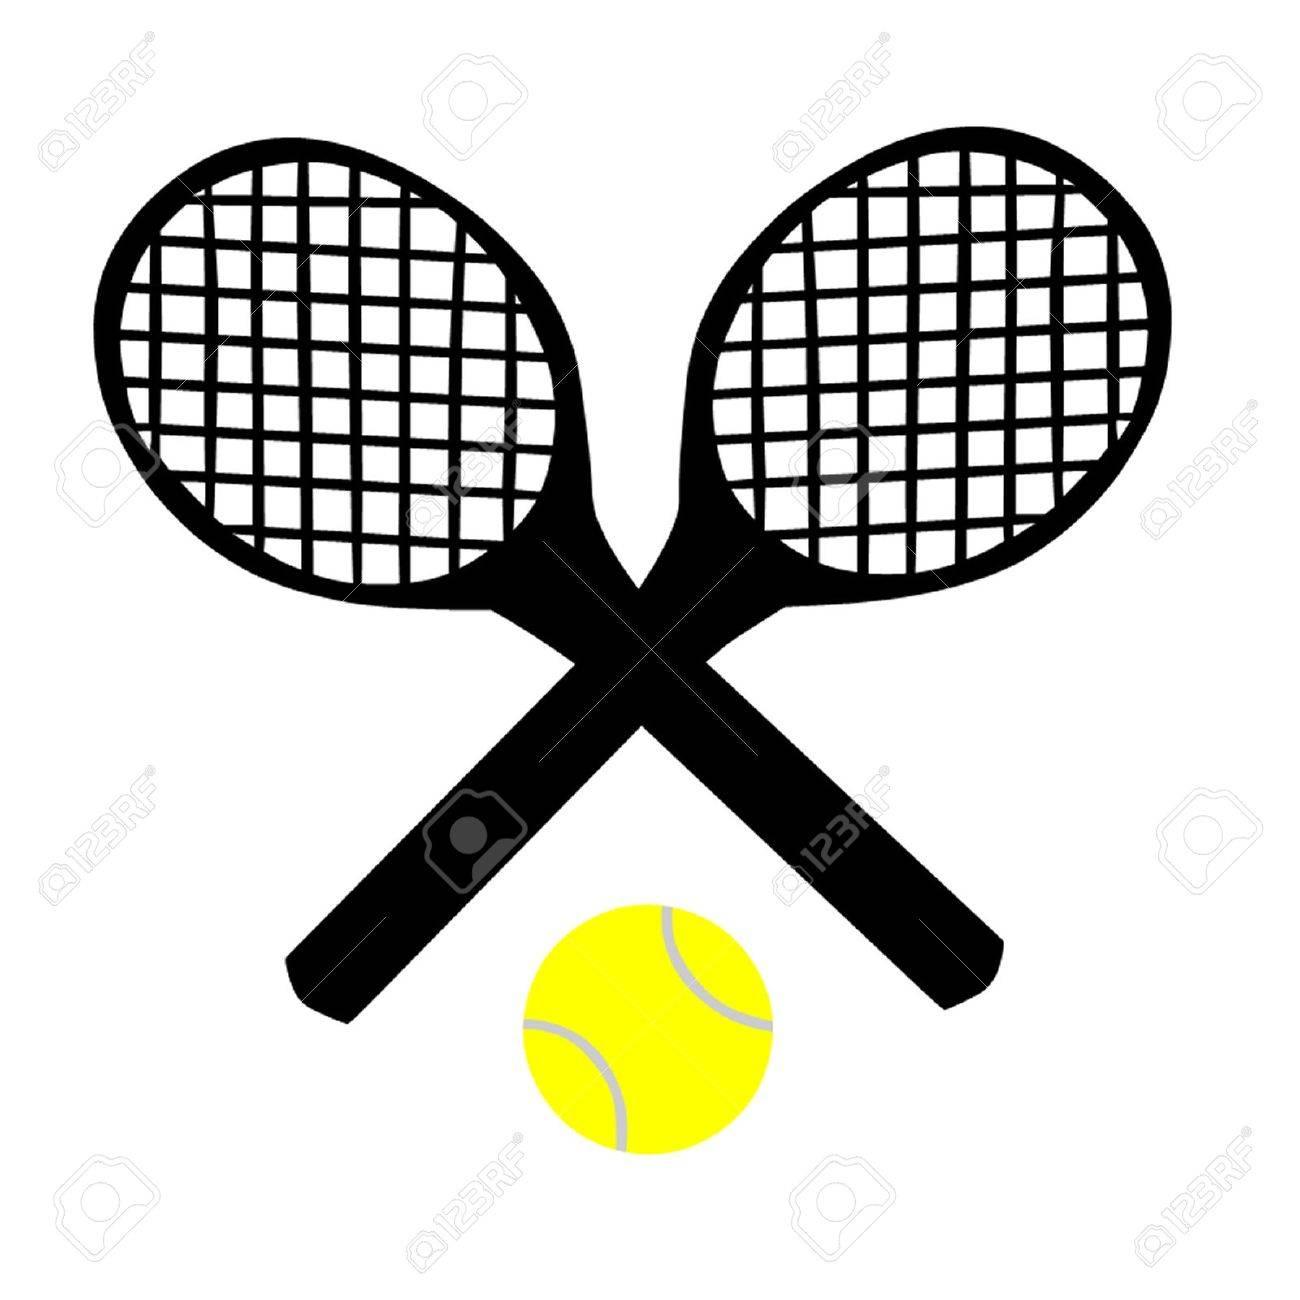 Tennis Rackets and Tennis Ball Stock Vector - 17531387